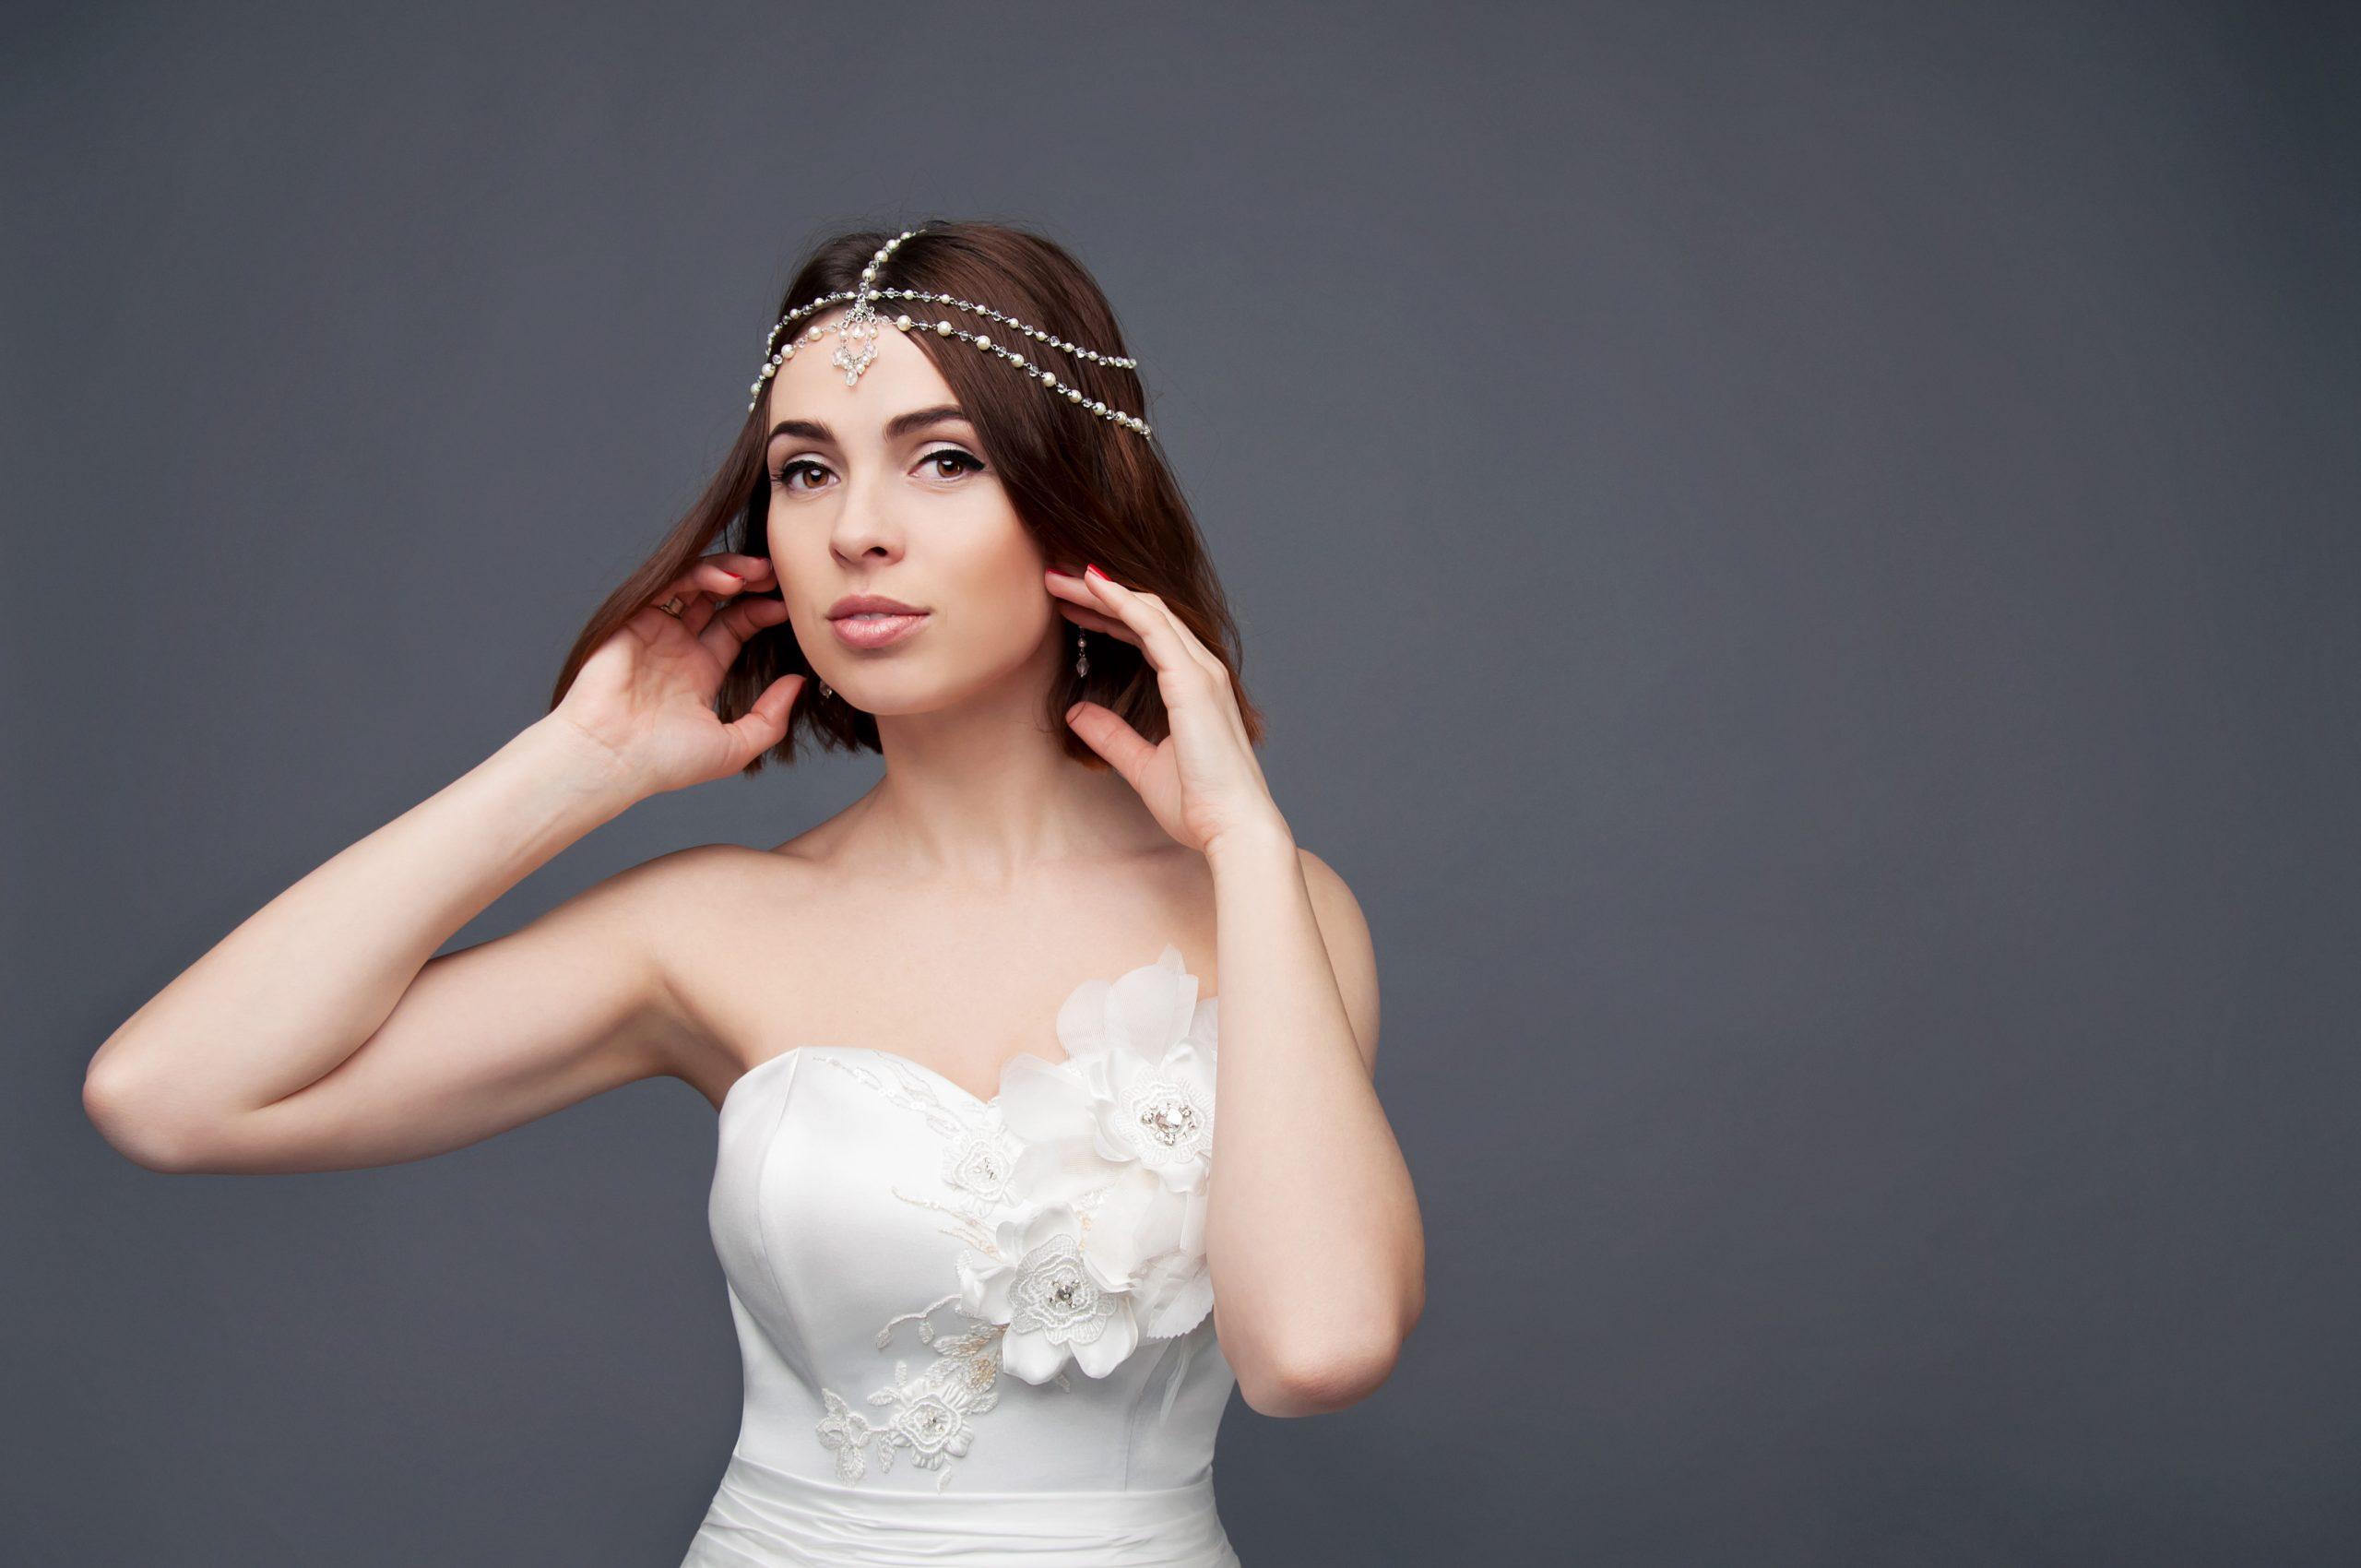 ozdoba na włosy panny młodej